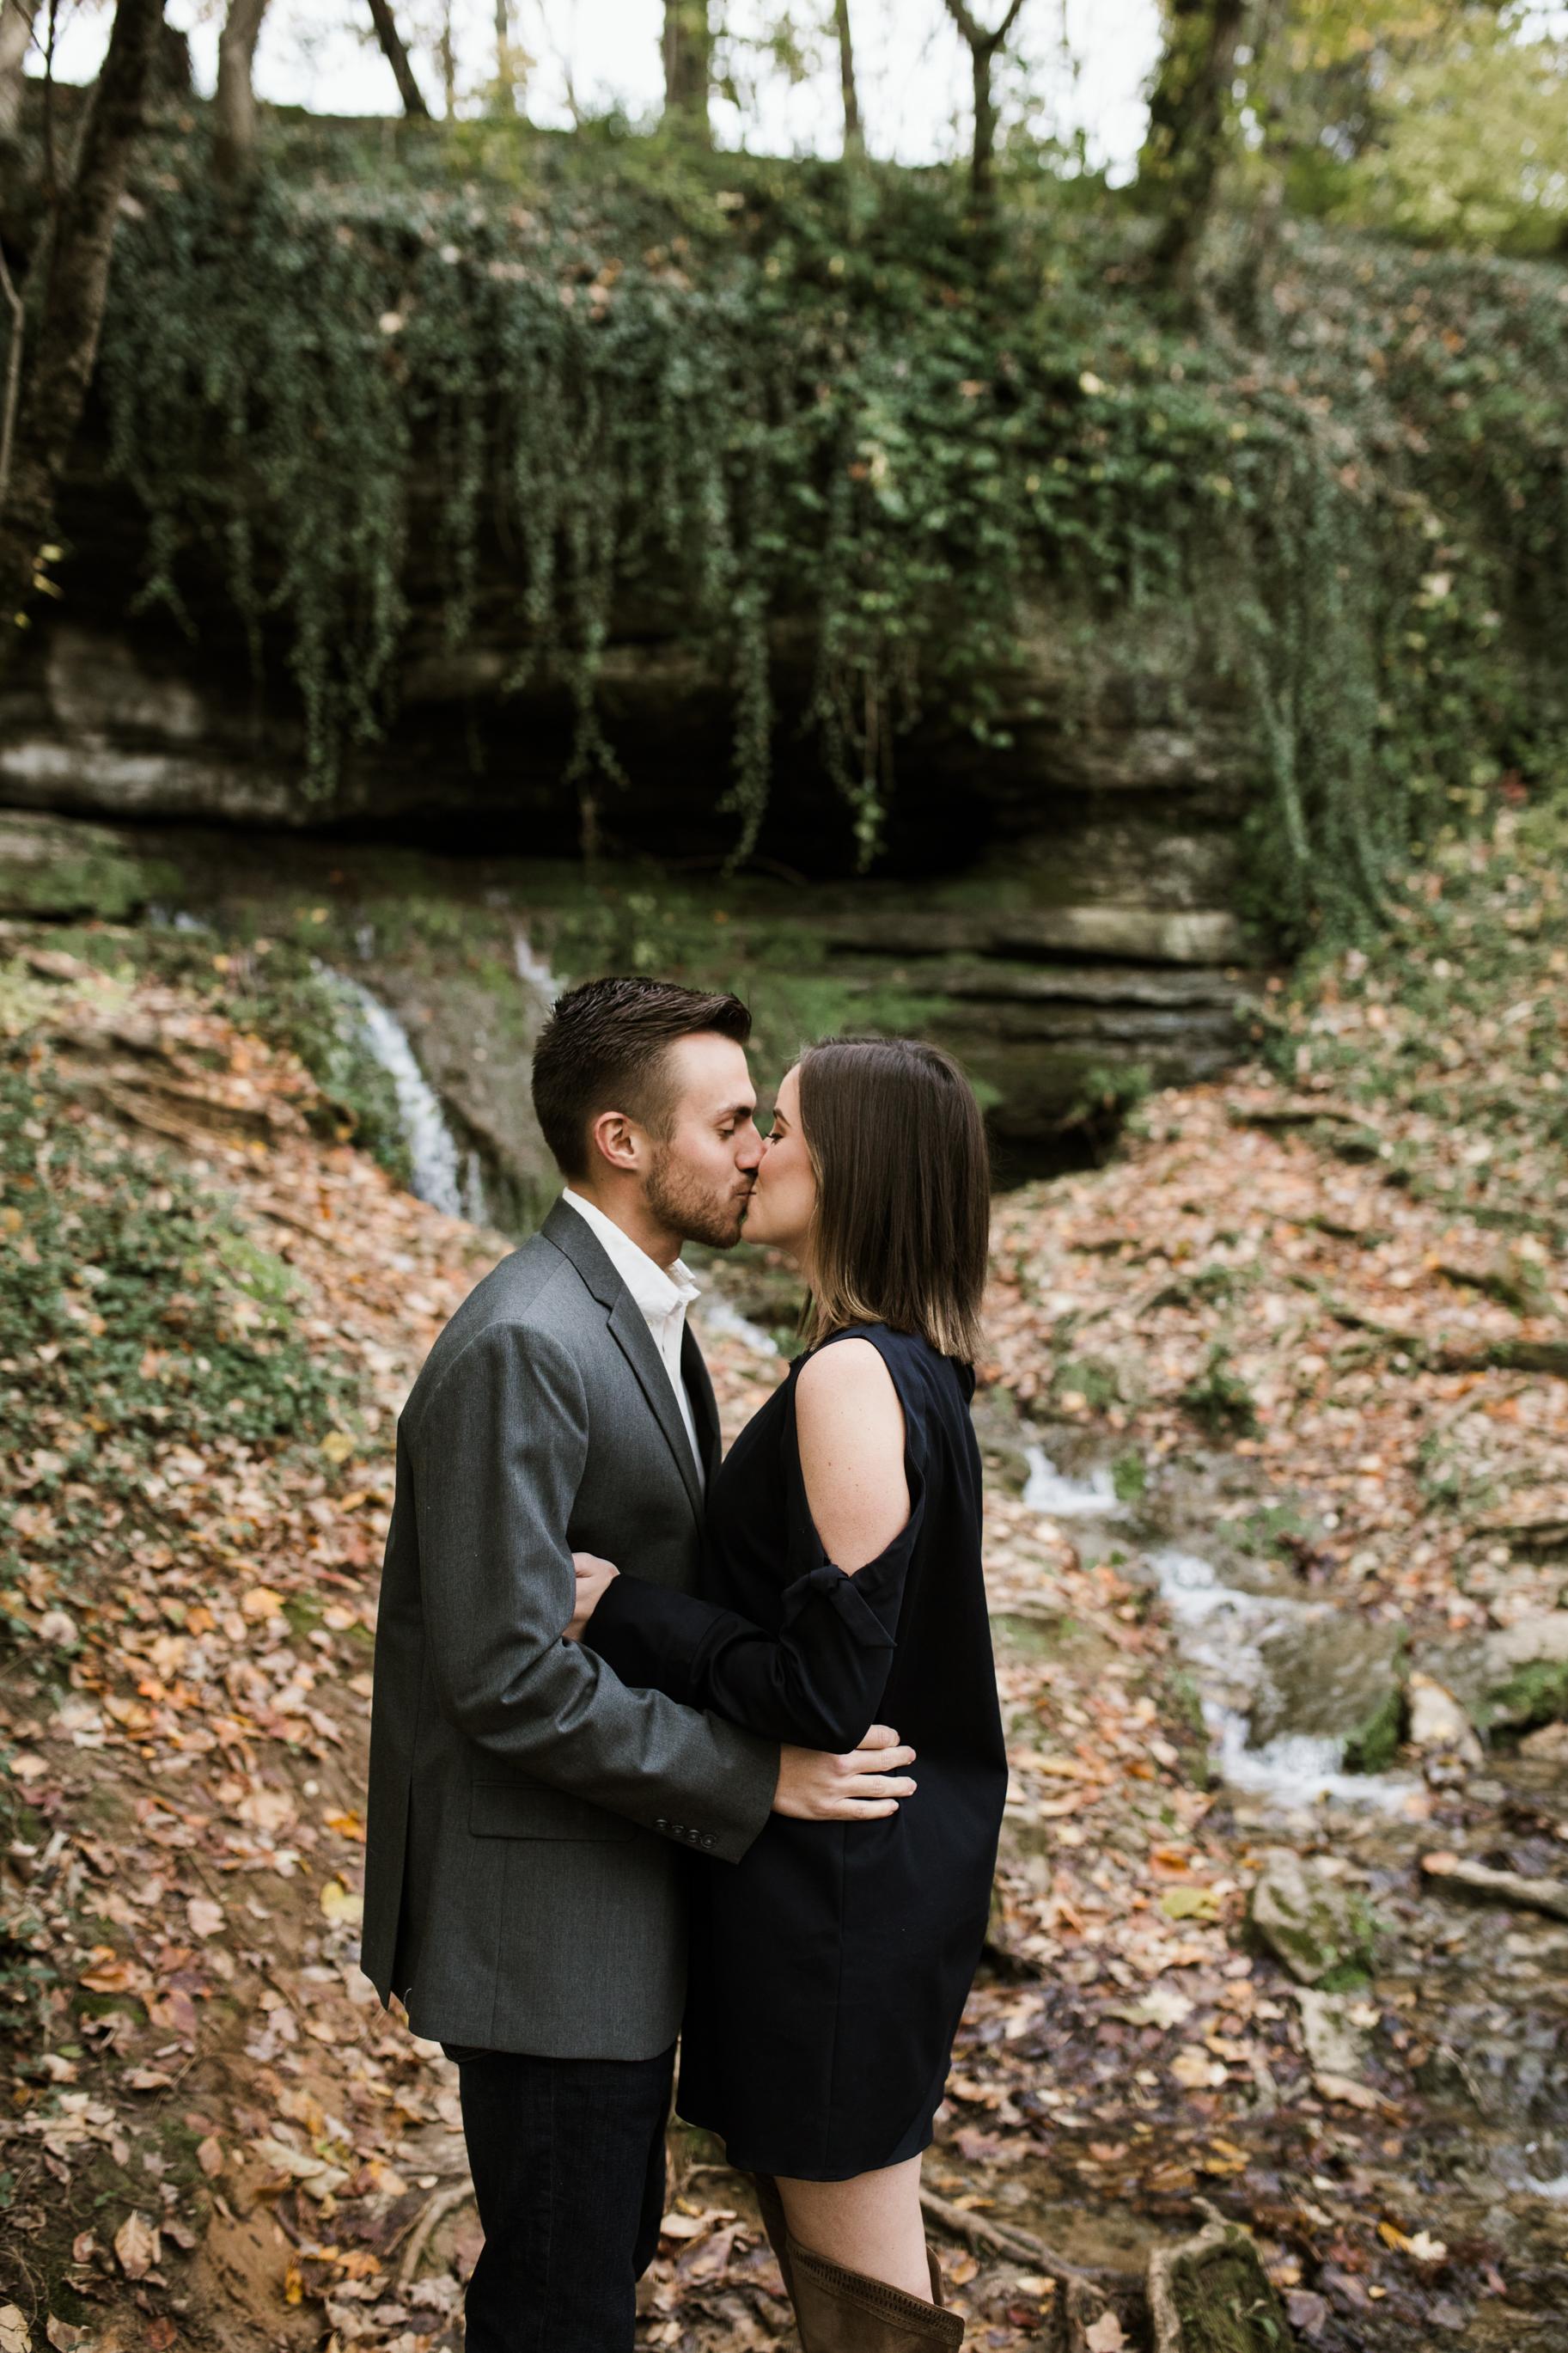 Kelsey and Daniel Engagement 2018 Crystal Ludwick Photo Louisville Wedding Photographer Kentucky Wedding Photographer (23 of 31).jpg